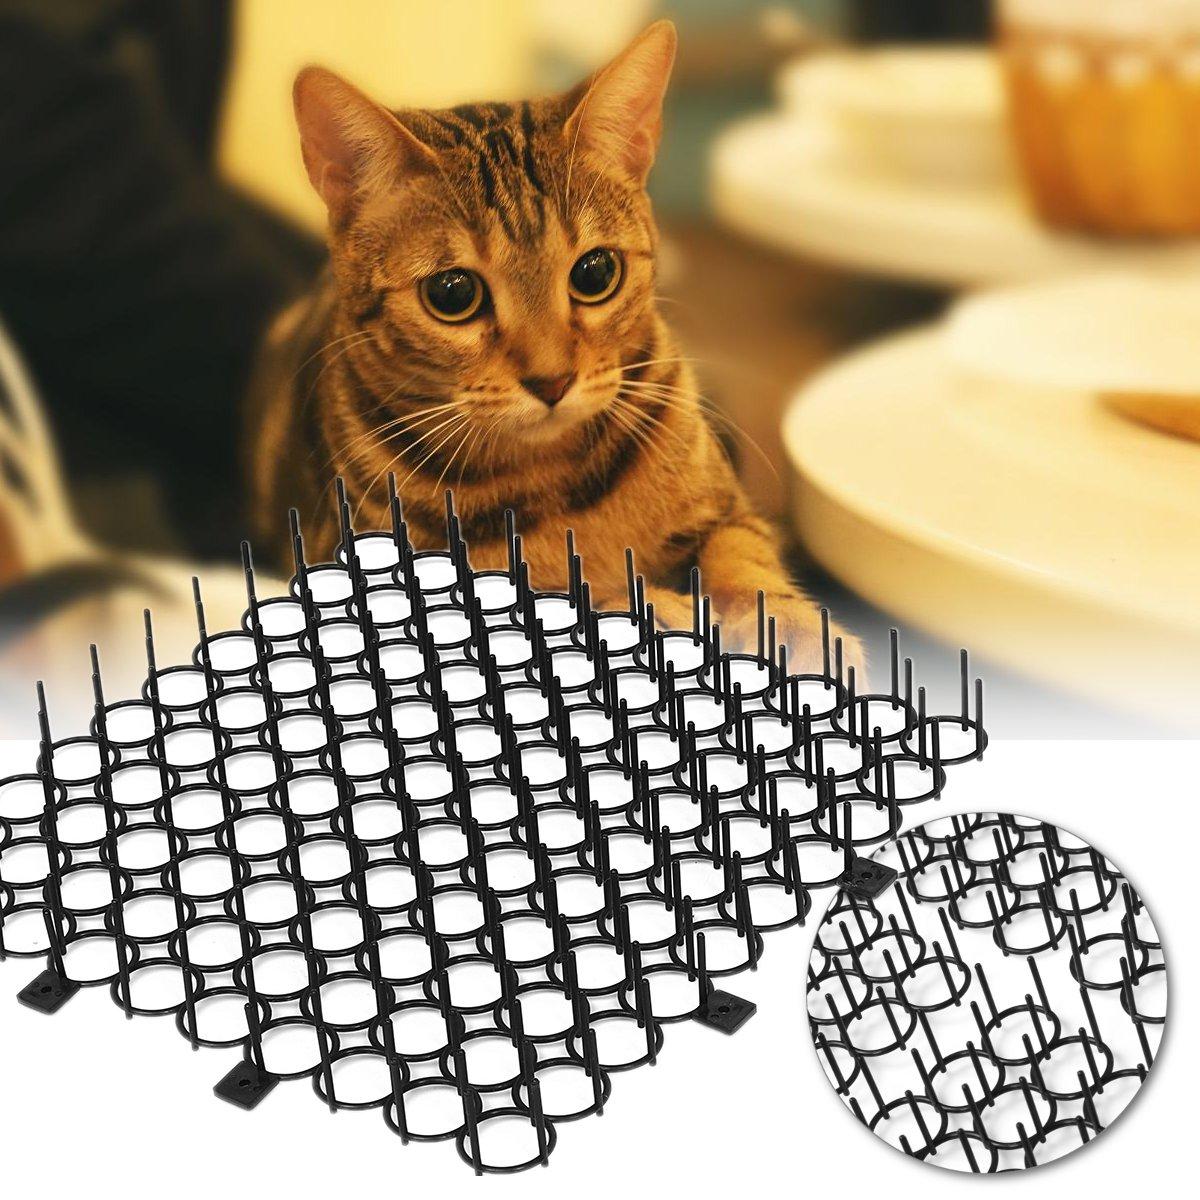 4Pcs / Set Anti Cat Pad Hage Klatre Prickle Wall Window Repellent Strip 22x22cm